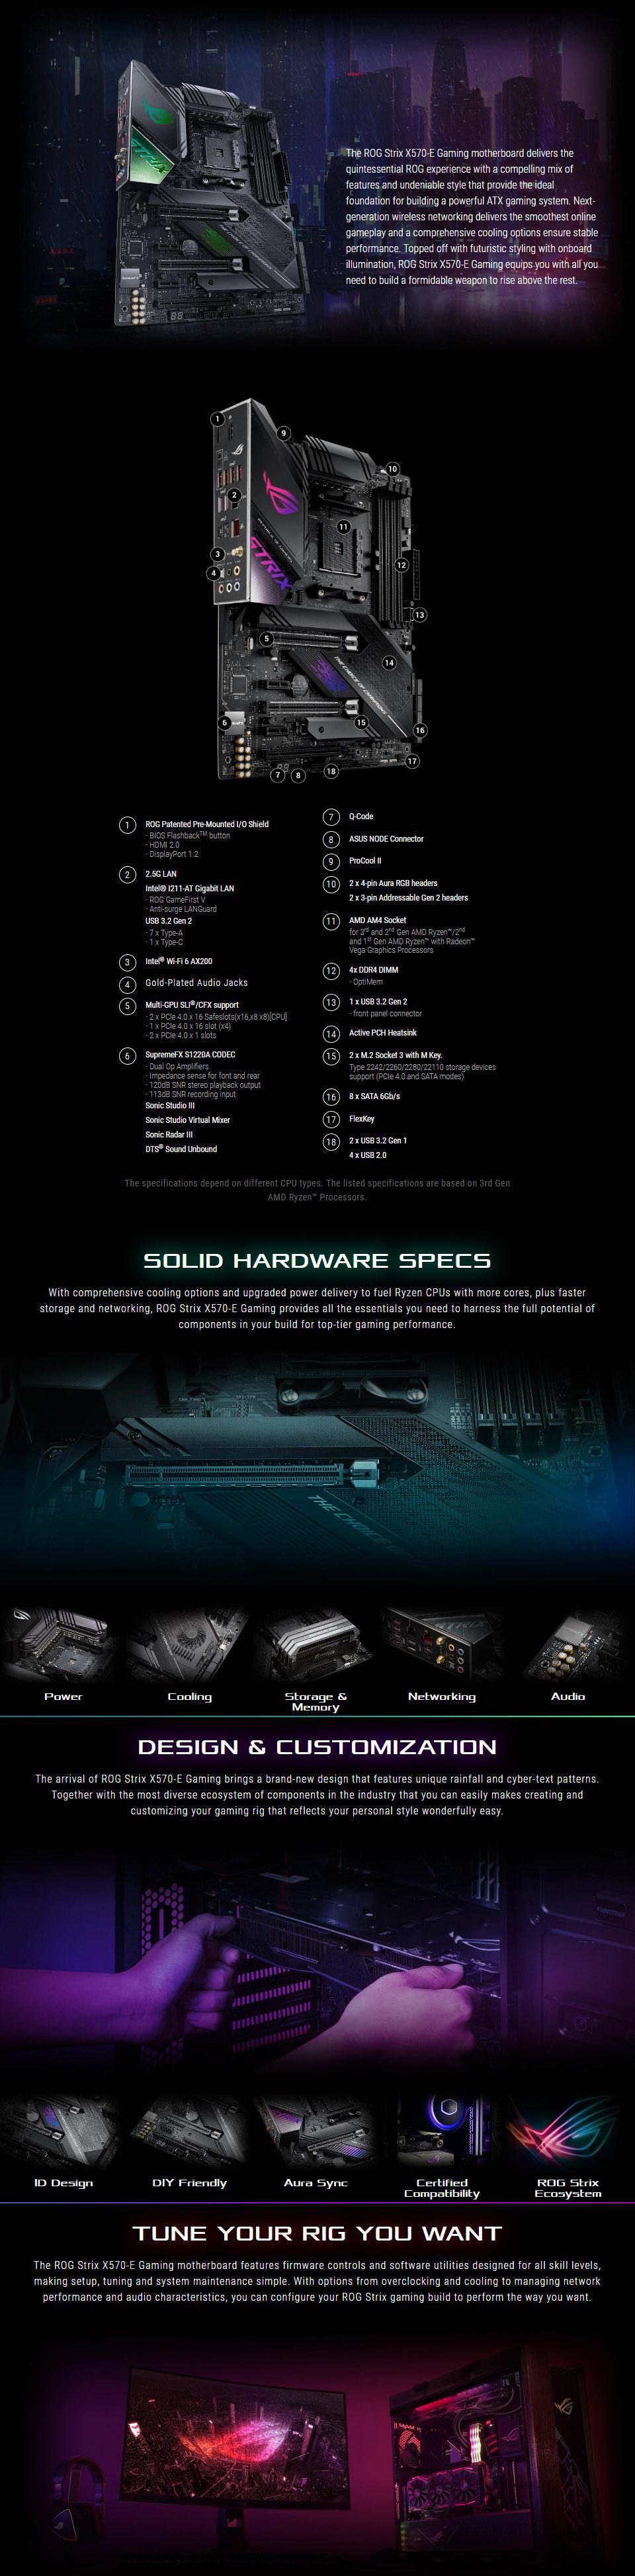 ASUS ROG Strix X570-E Gaming Motherboard